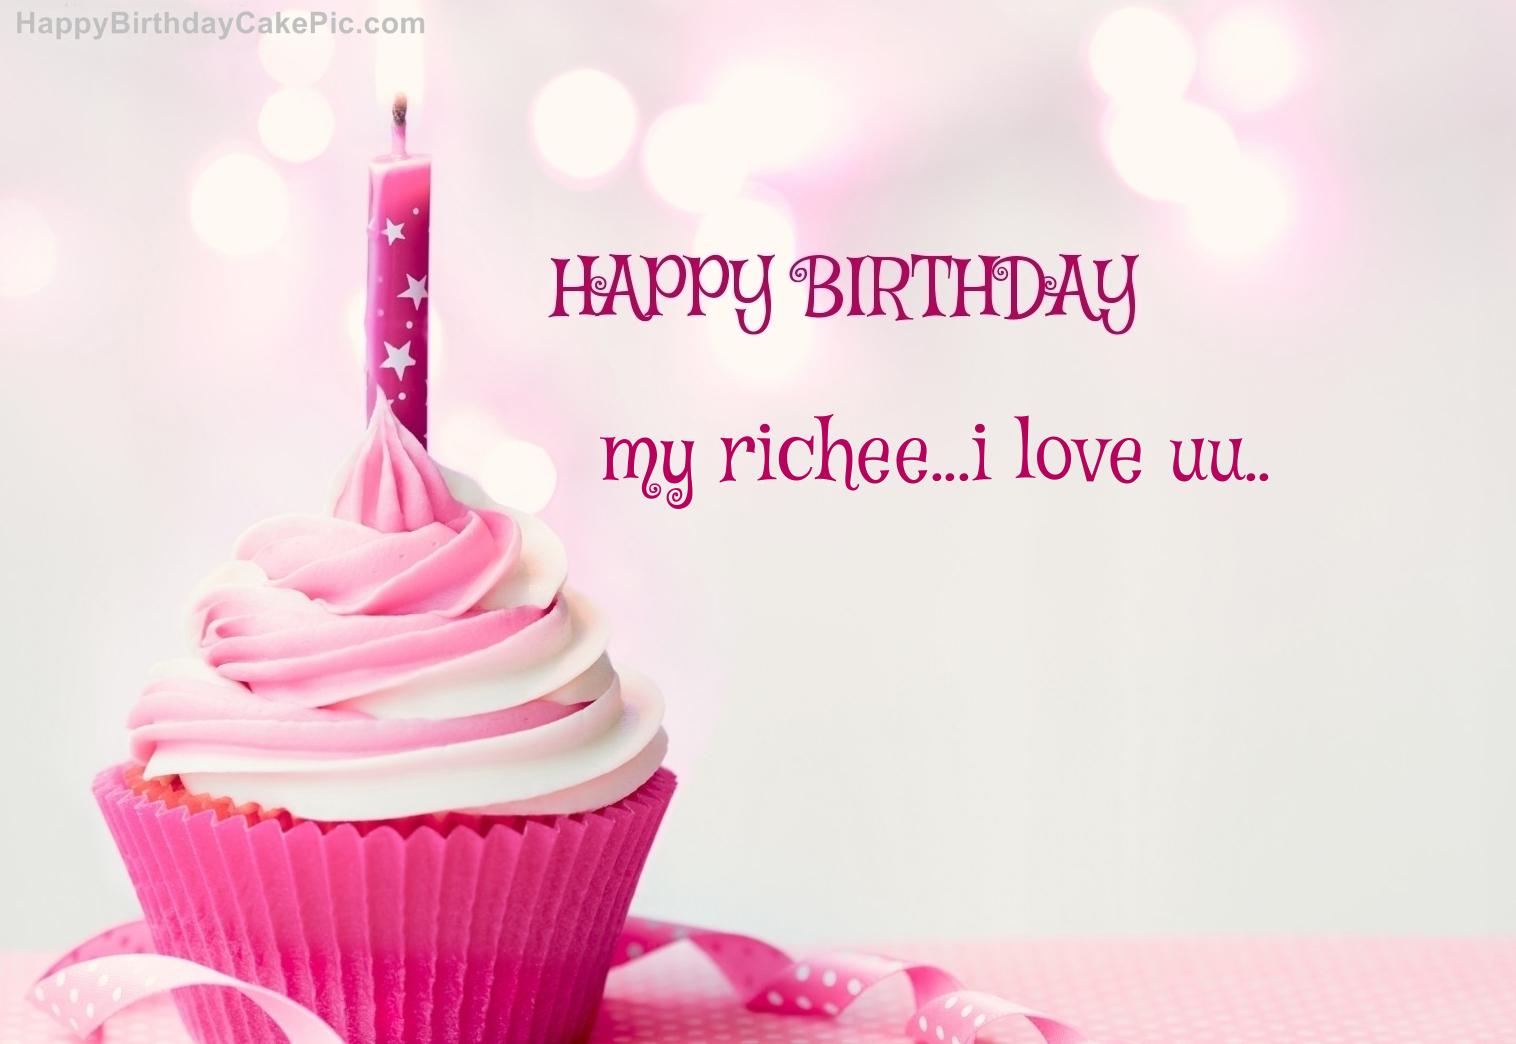 happy birthday cupcake candle pink cake for my richee i love uu